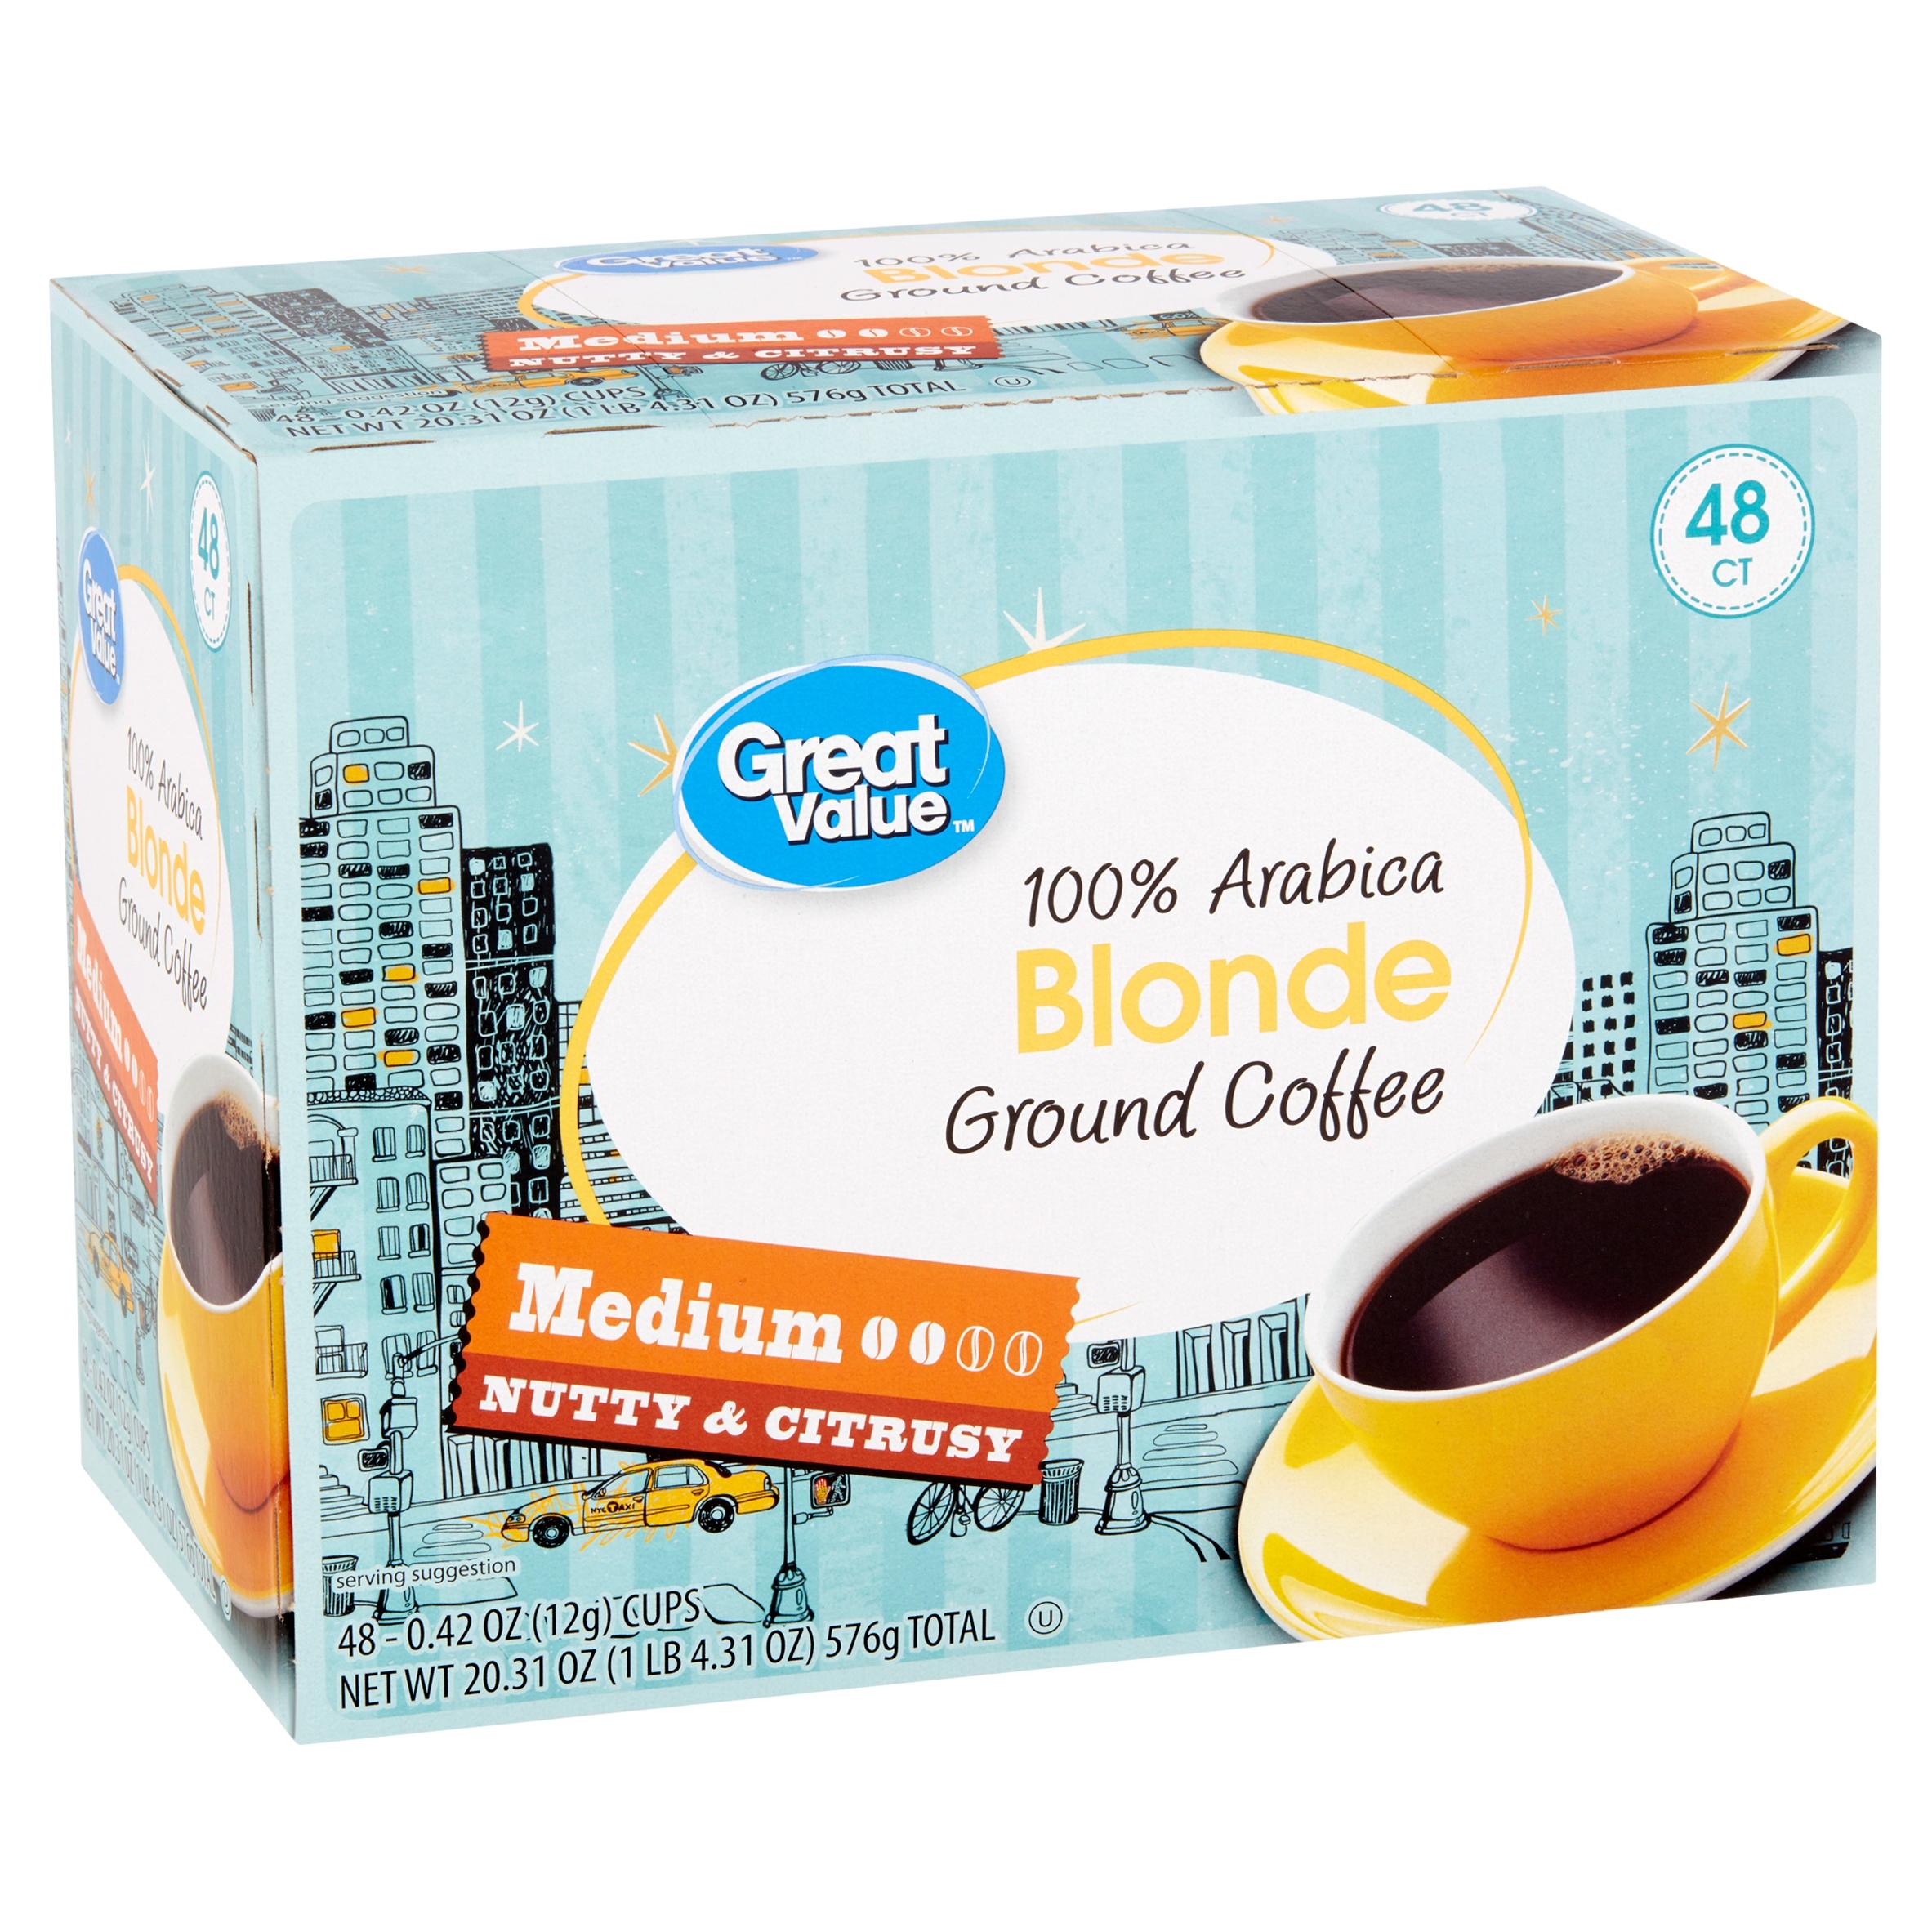 Great Value 100% Arabica Blonde Medium Ground Coffee, 0.42 oz, 48 count